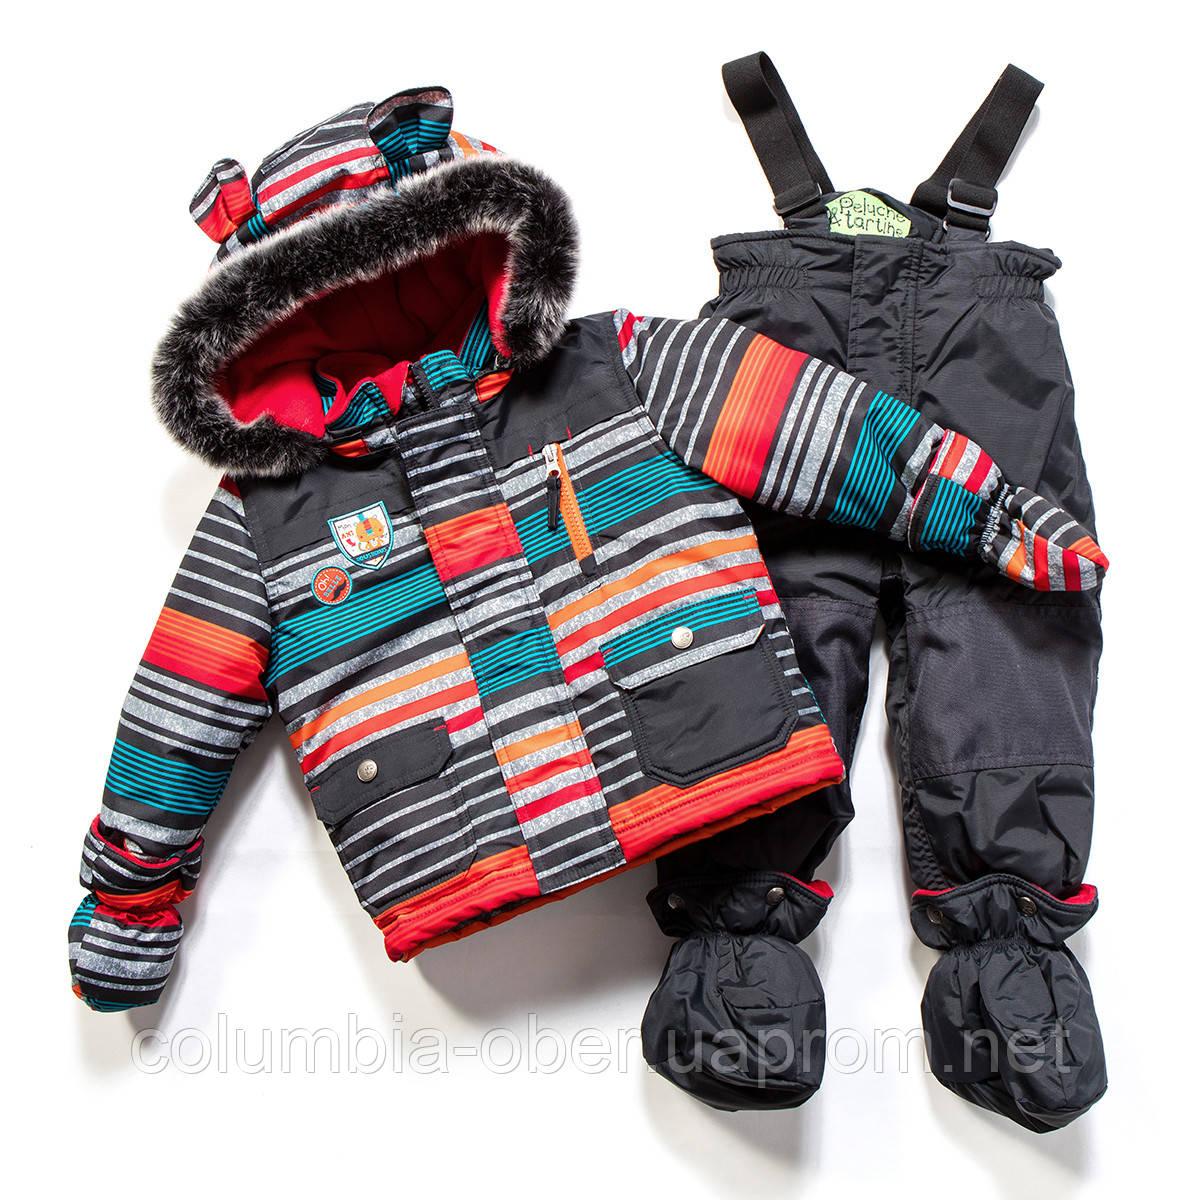 Зимний костюм для мальчика PELUCHE F17 M 09 BG Deep Grey. Размеры 12 - 24 мес.